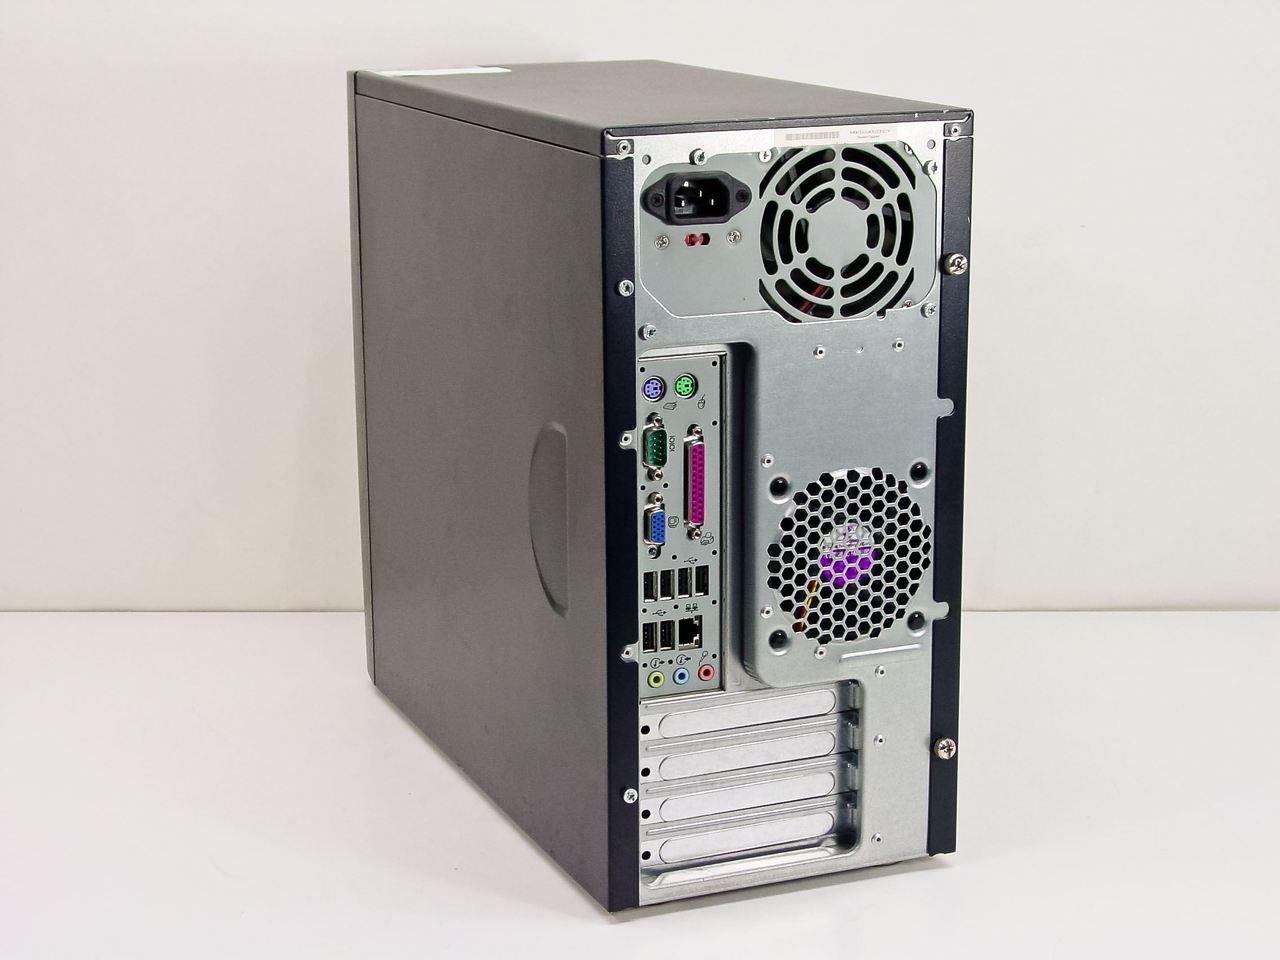 HP DX2000 MT VIDEO WINDOWS 8 DRIVERS DOWNLOAD